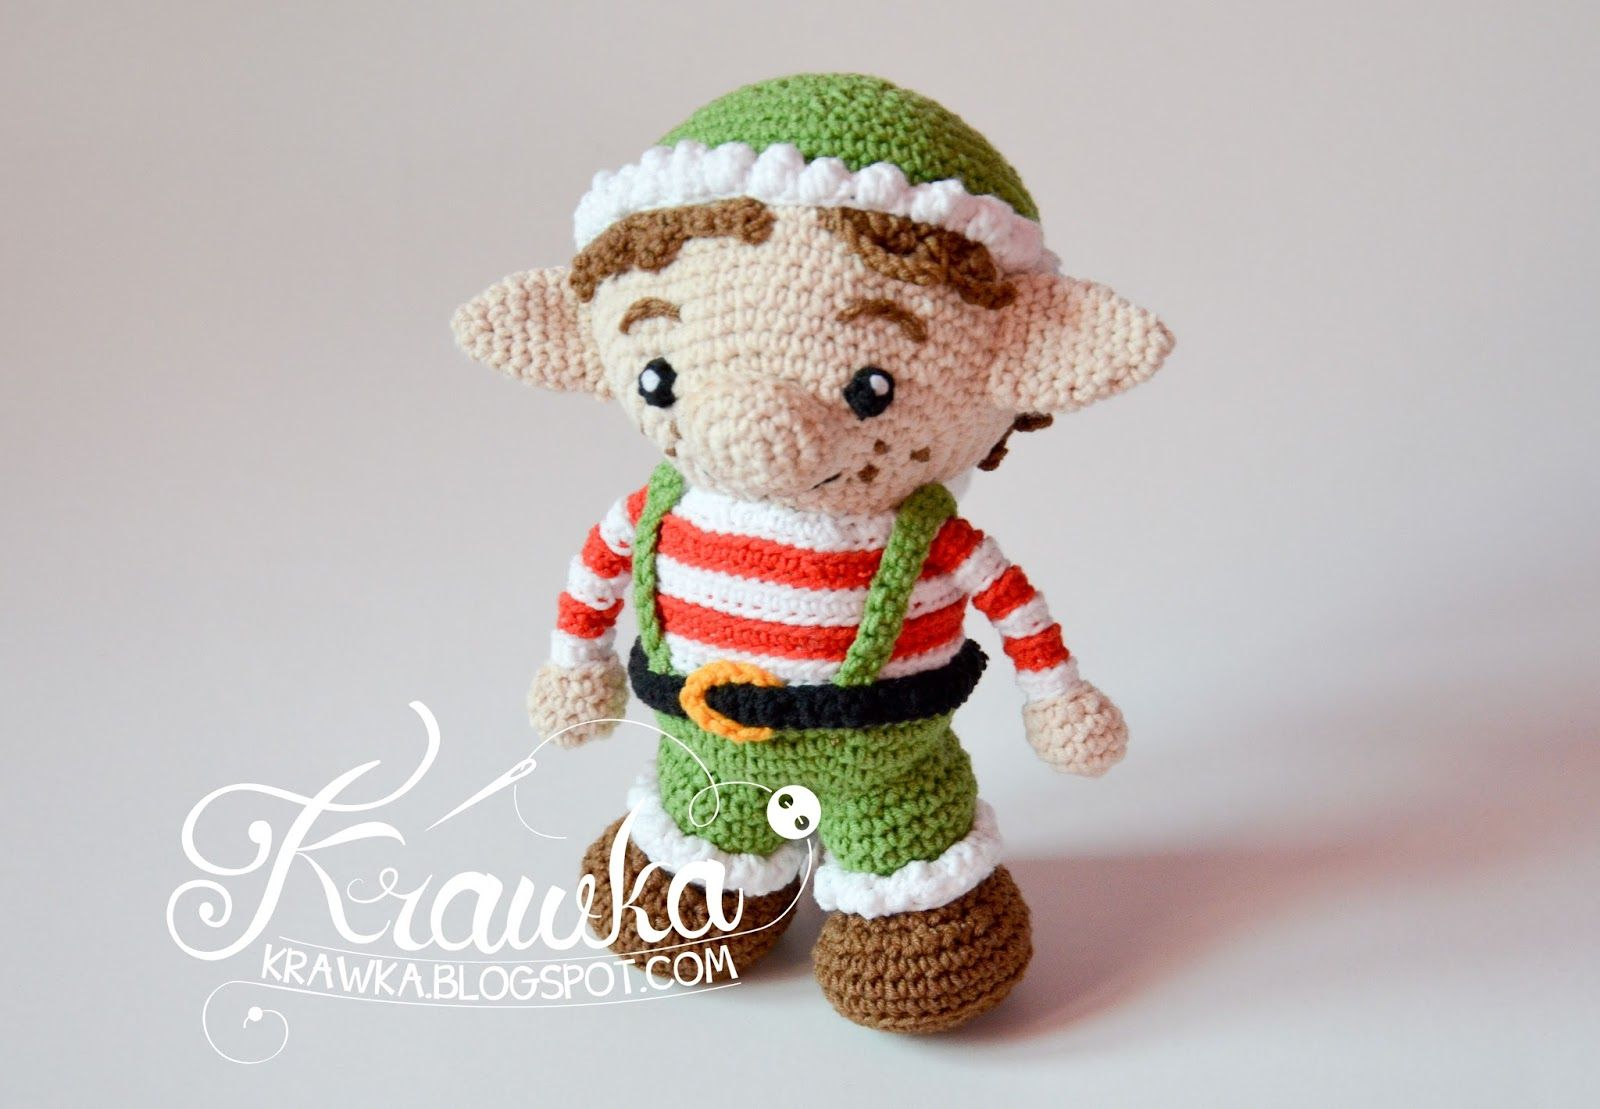 Christmas elf crochet pattern https://www.etsy.com/listing/483323396 ...